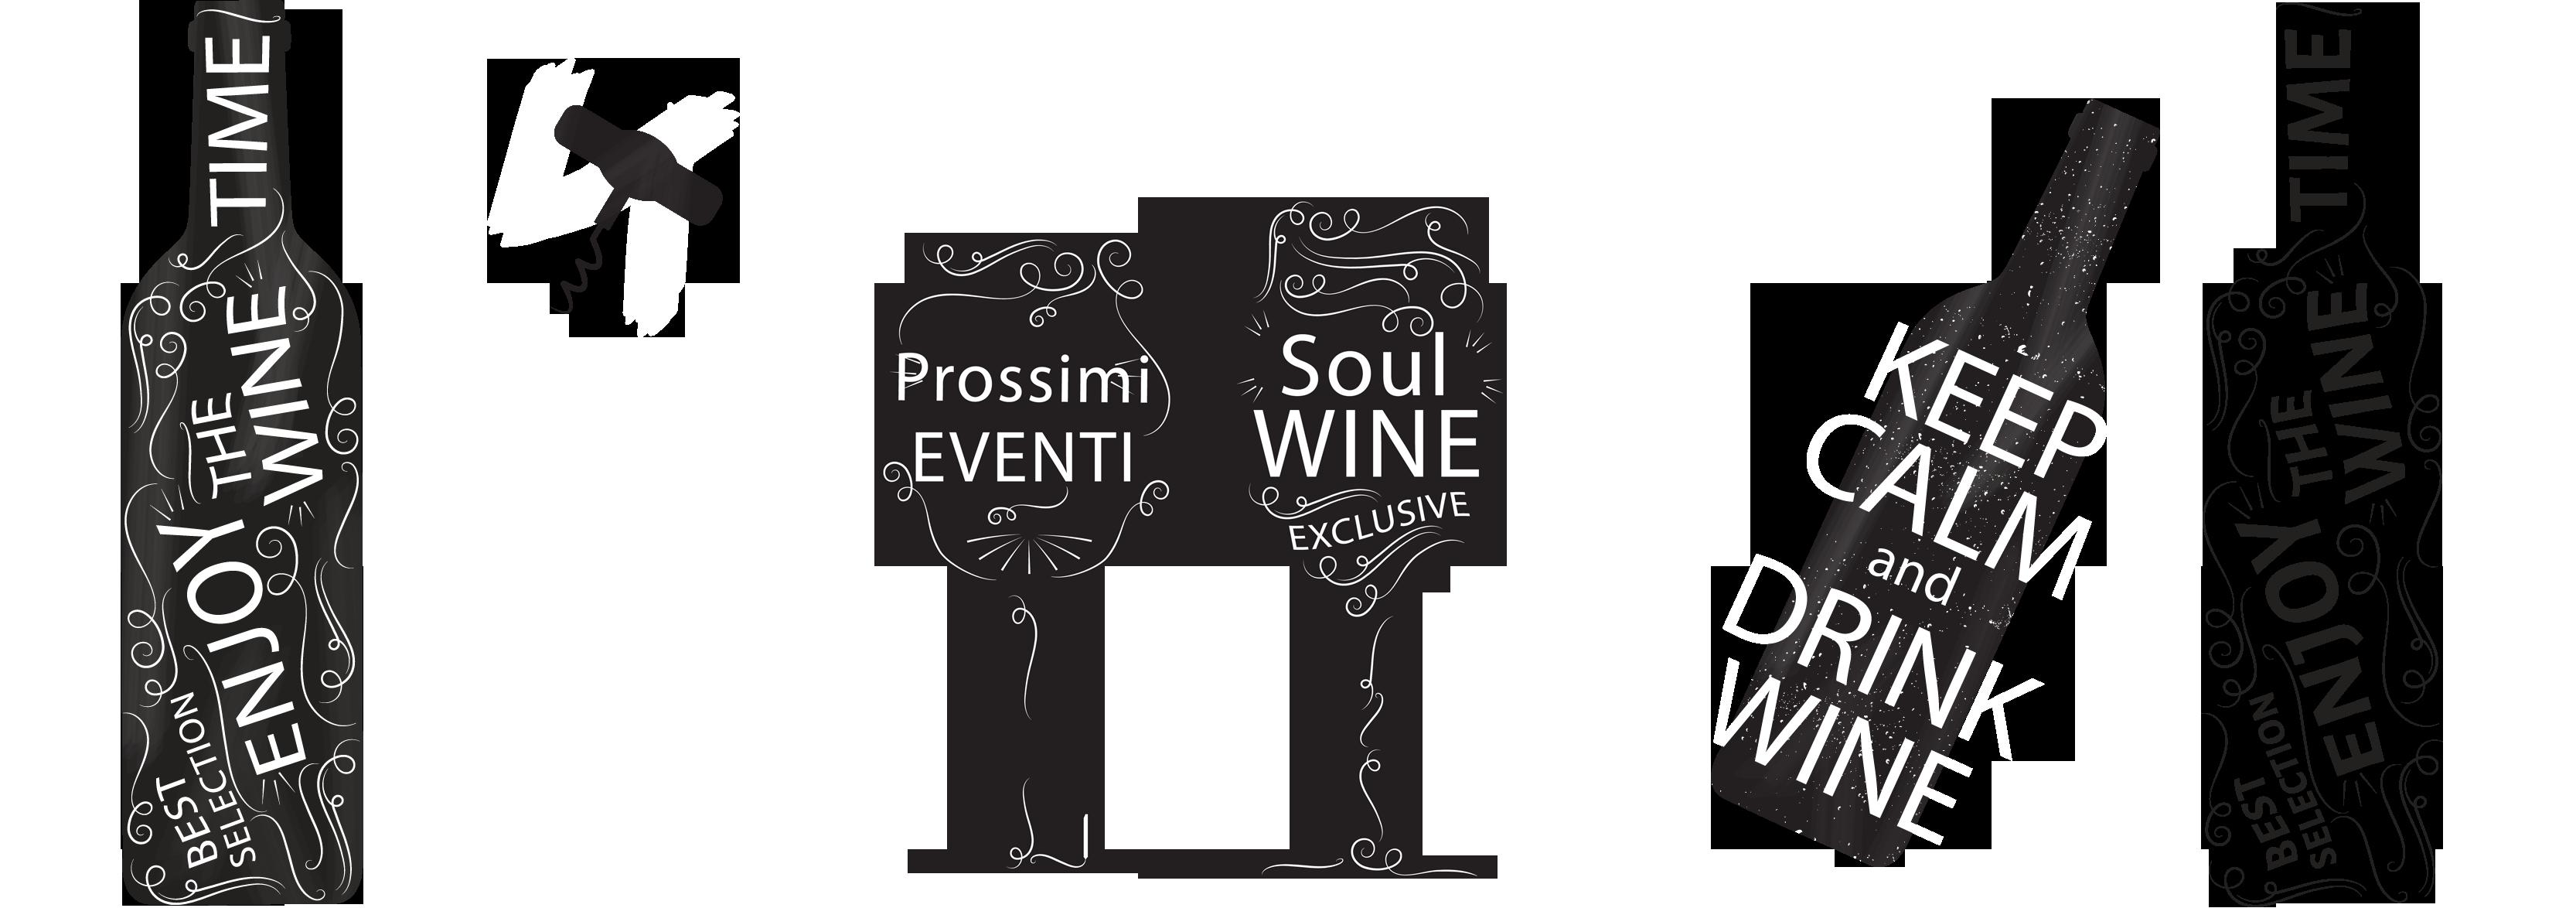 Logo_eventi_soulwine_bottiglie.png